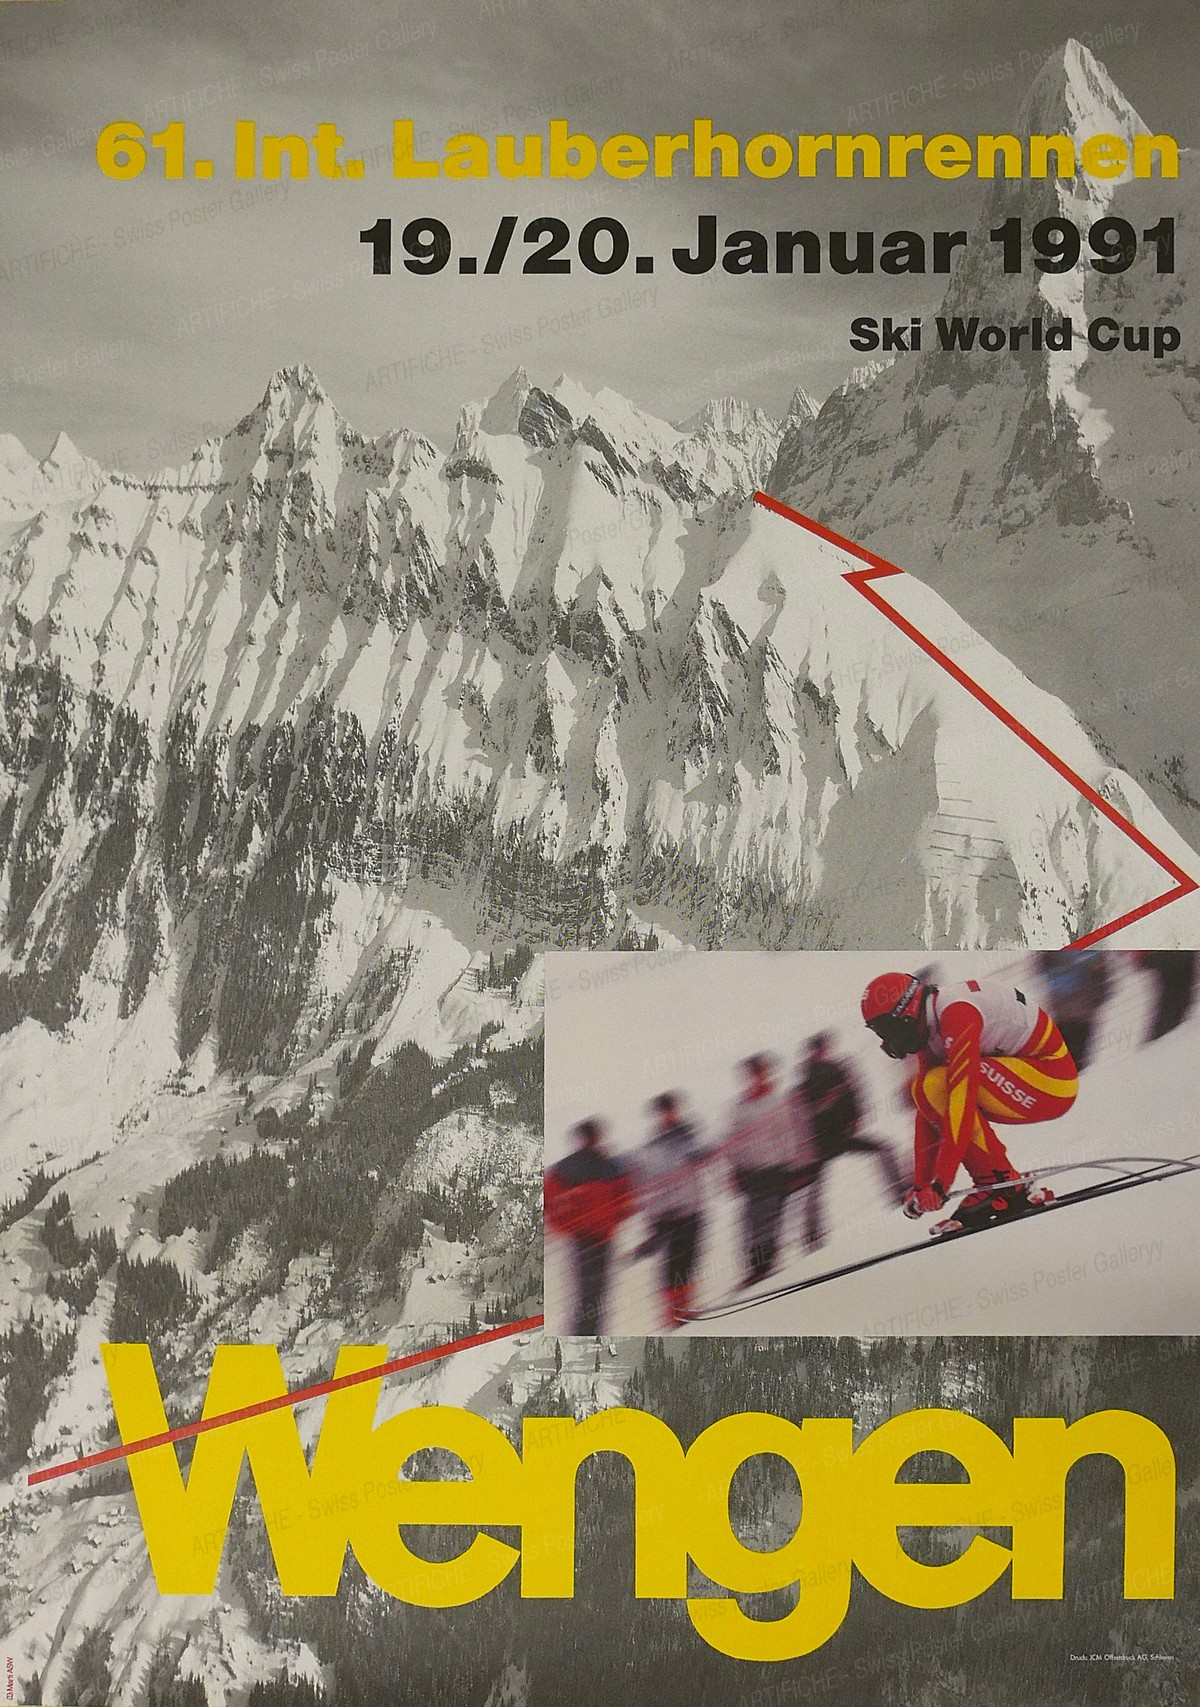 Wengen – 61. Int. Lauberhornrennen 1991, Ueli Marti